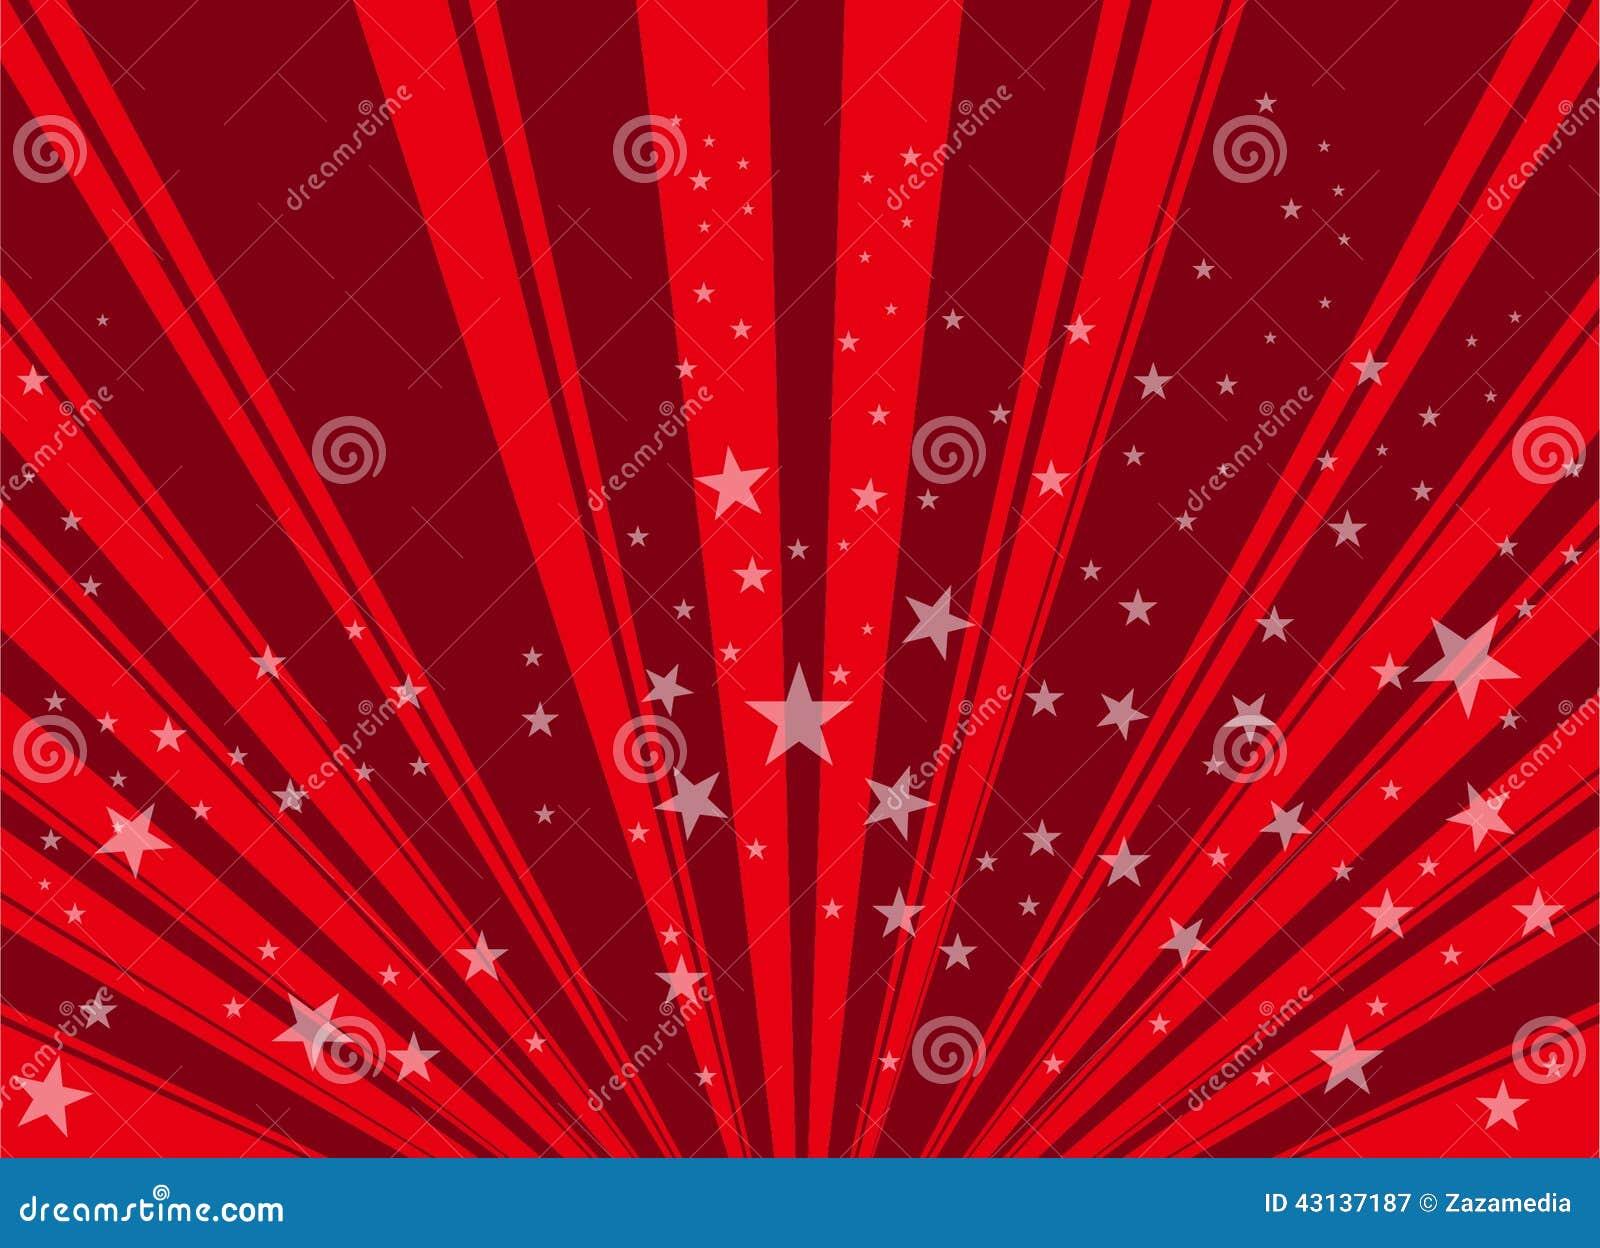 Red Star Background Stock Illustration - Image: 43137187